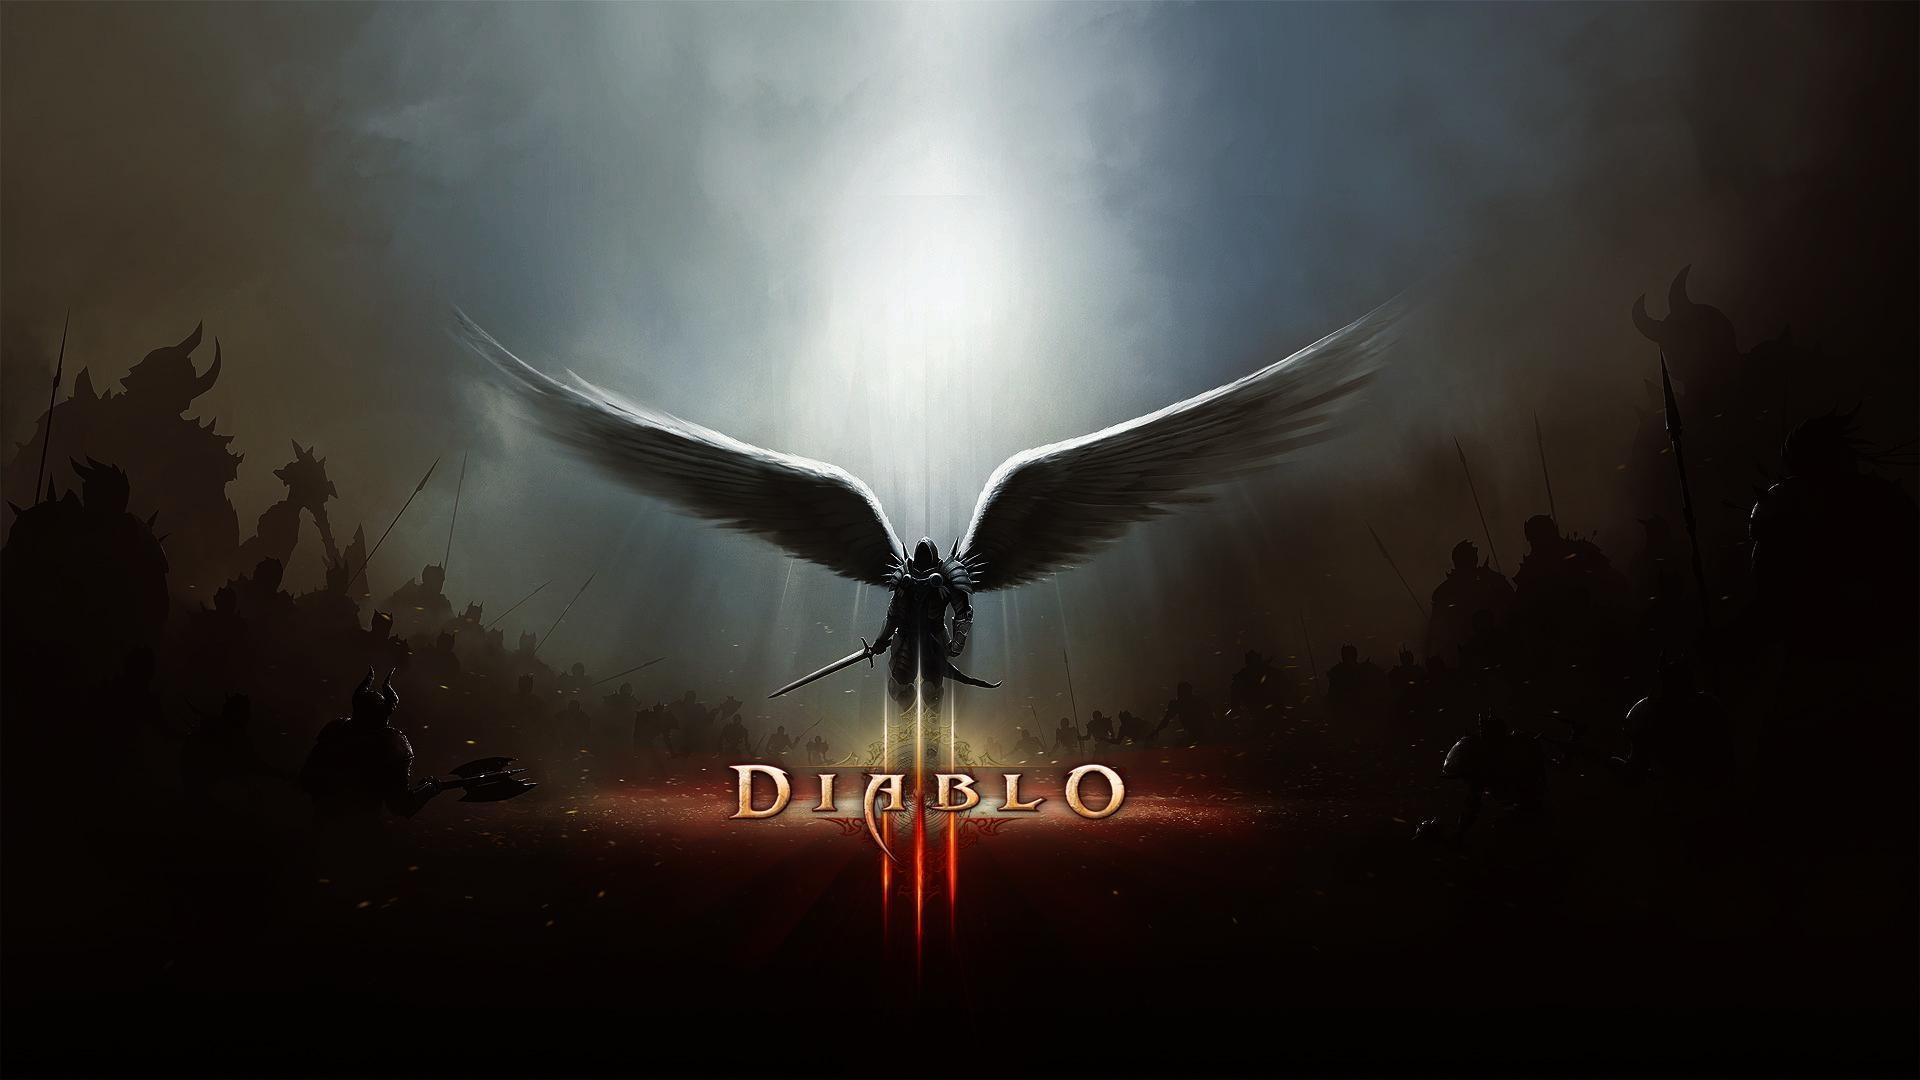 Diablo Iii Hd Wallpaper Background Image 1920x1080 Id 508574